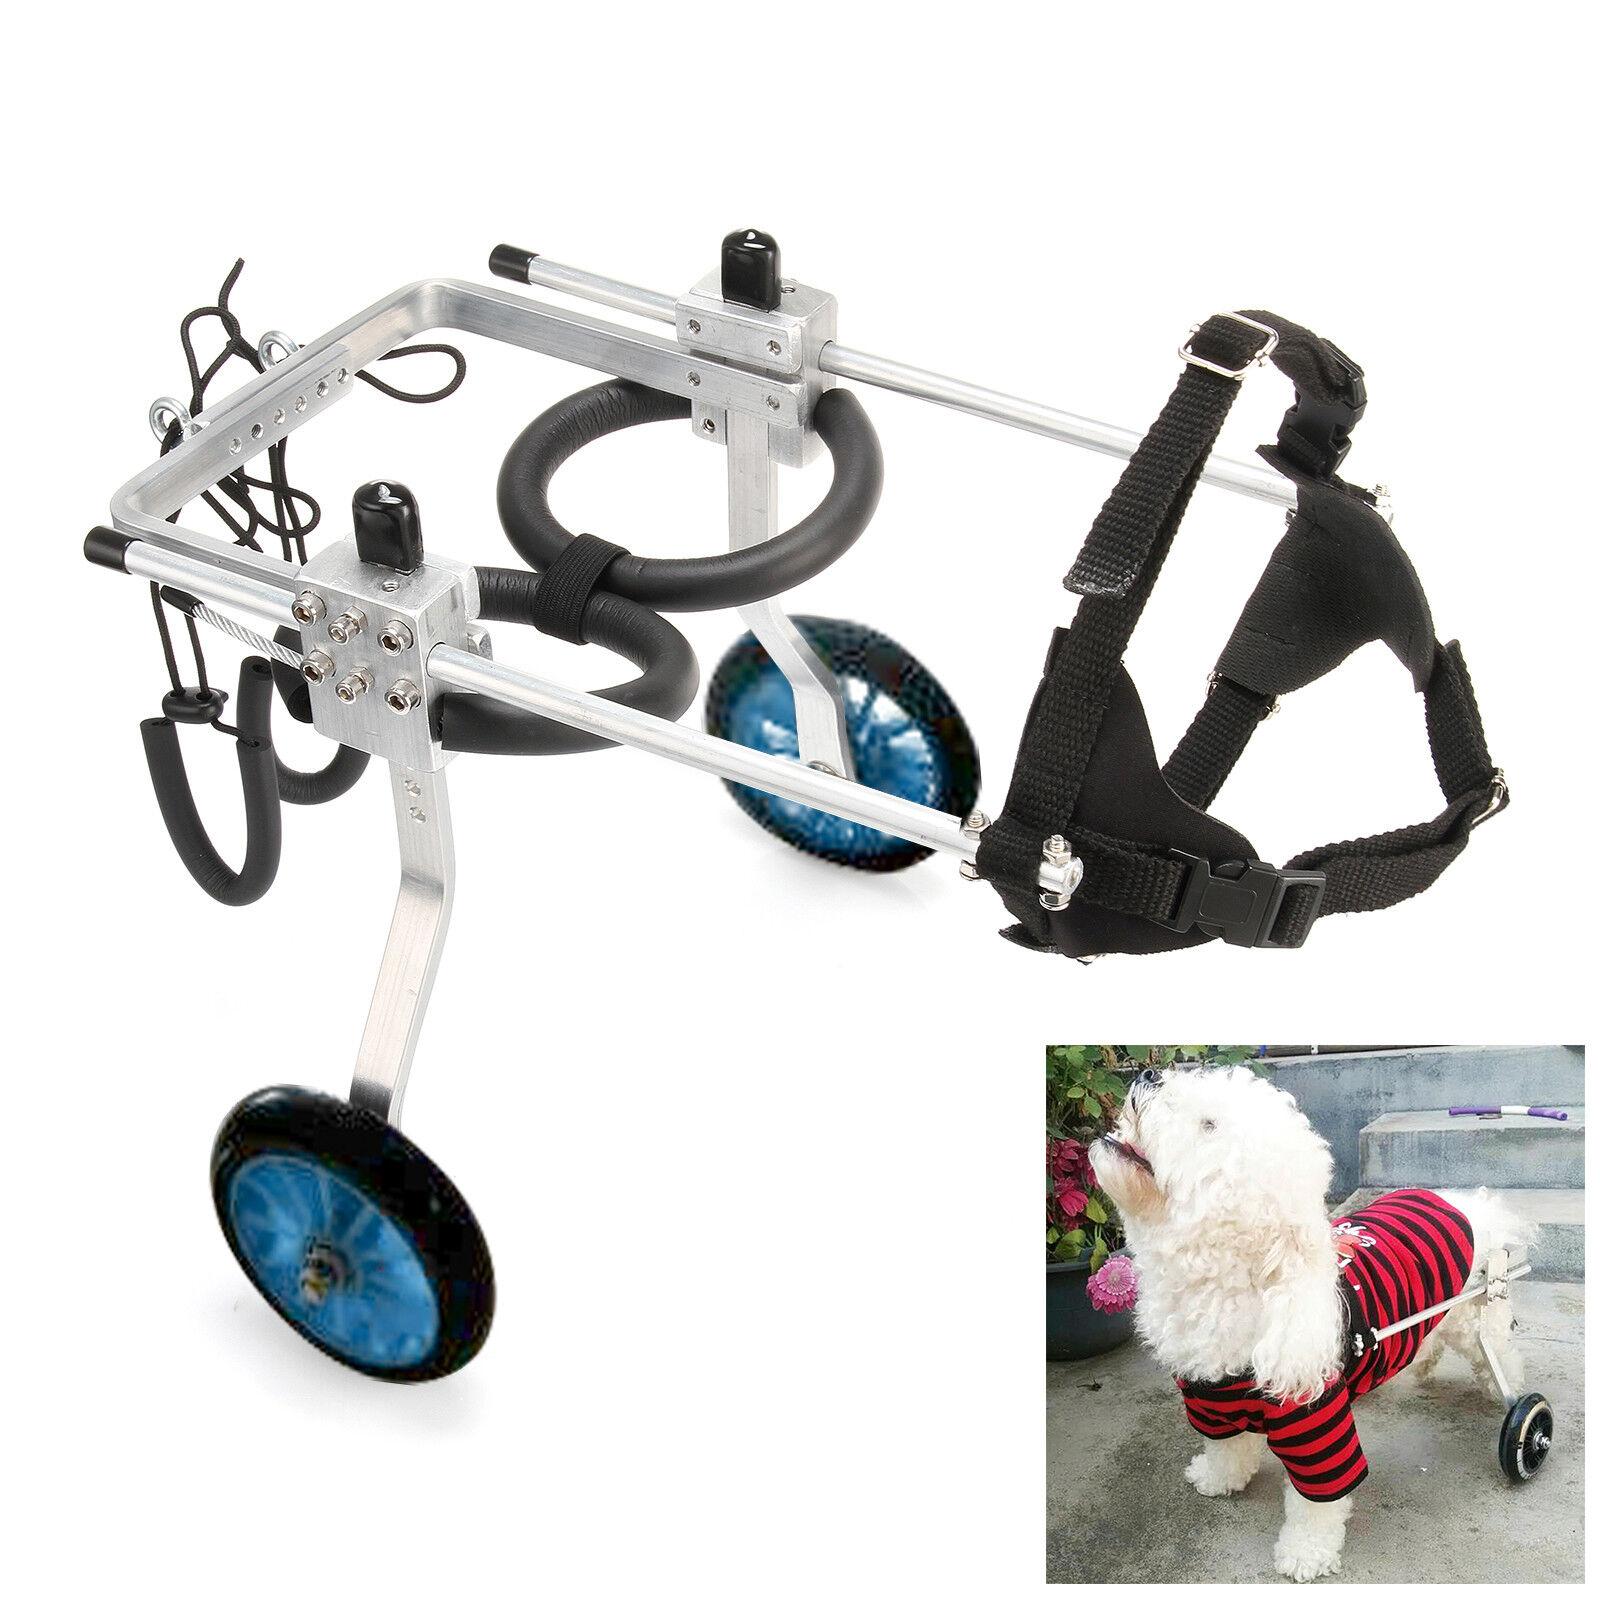 PET sedia a rossoelle disabili Cucciolo Cucciolo Cucciolo Gatto Cane Zampa Posteriore disabili acciaio inox 29cdc6